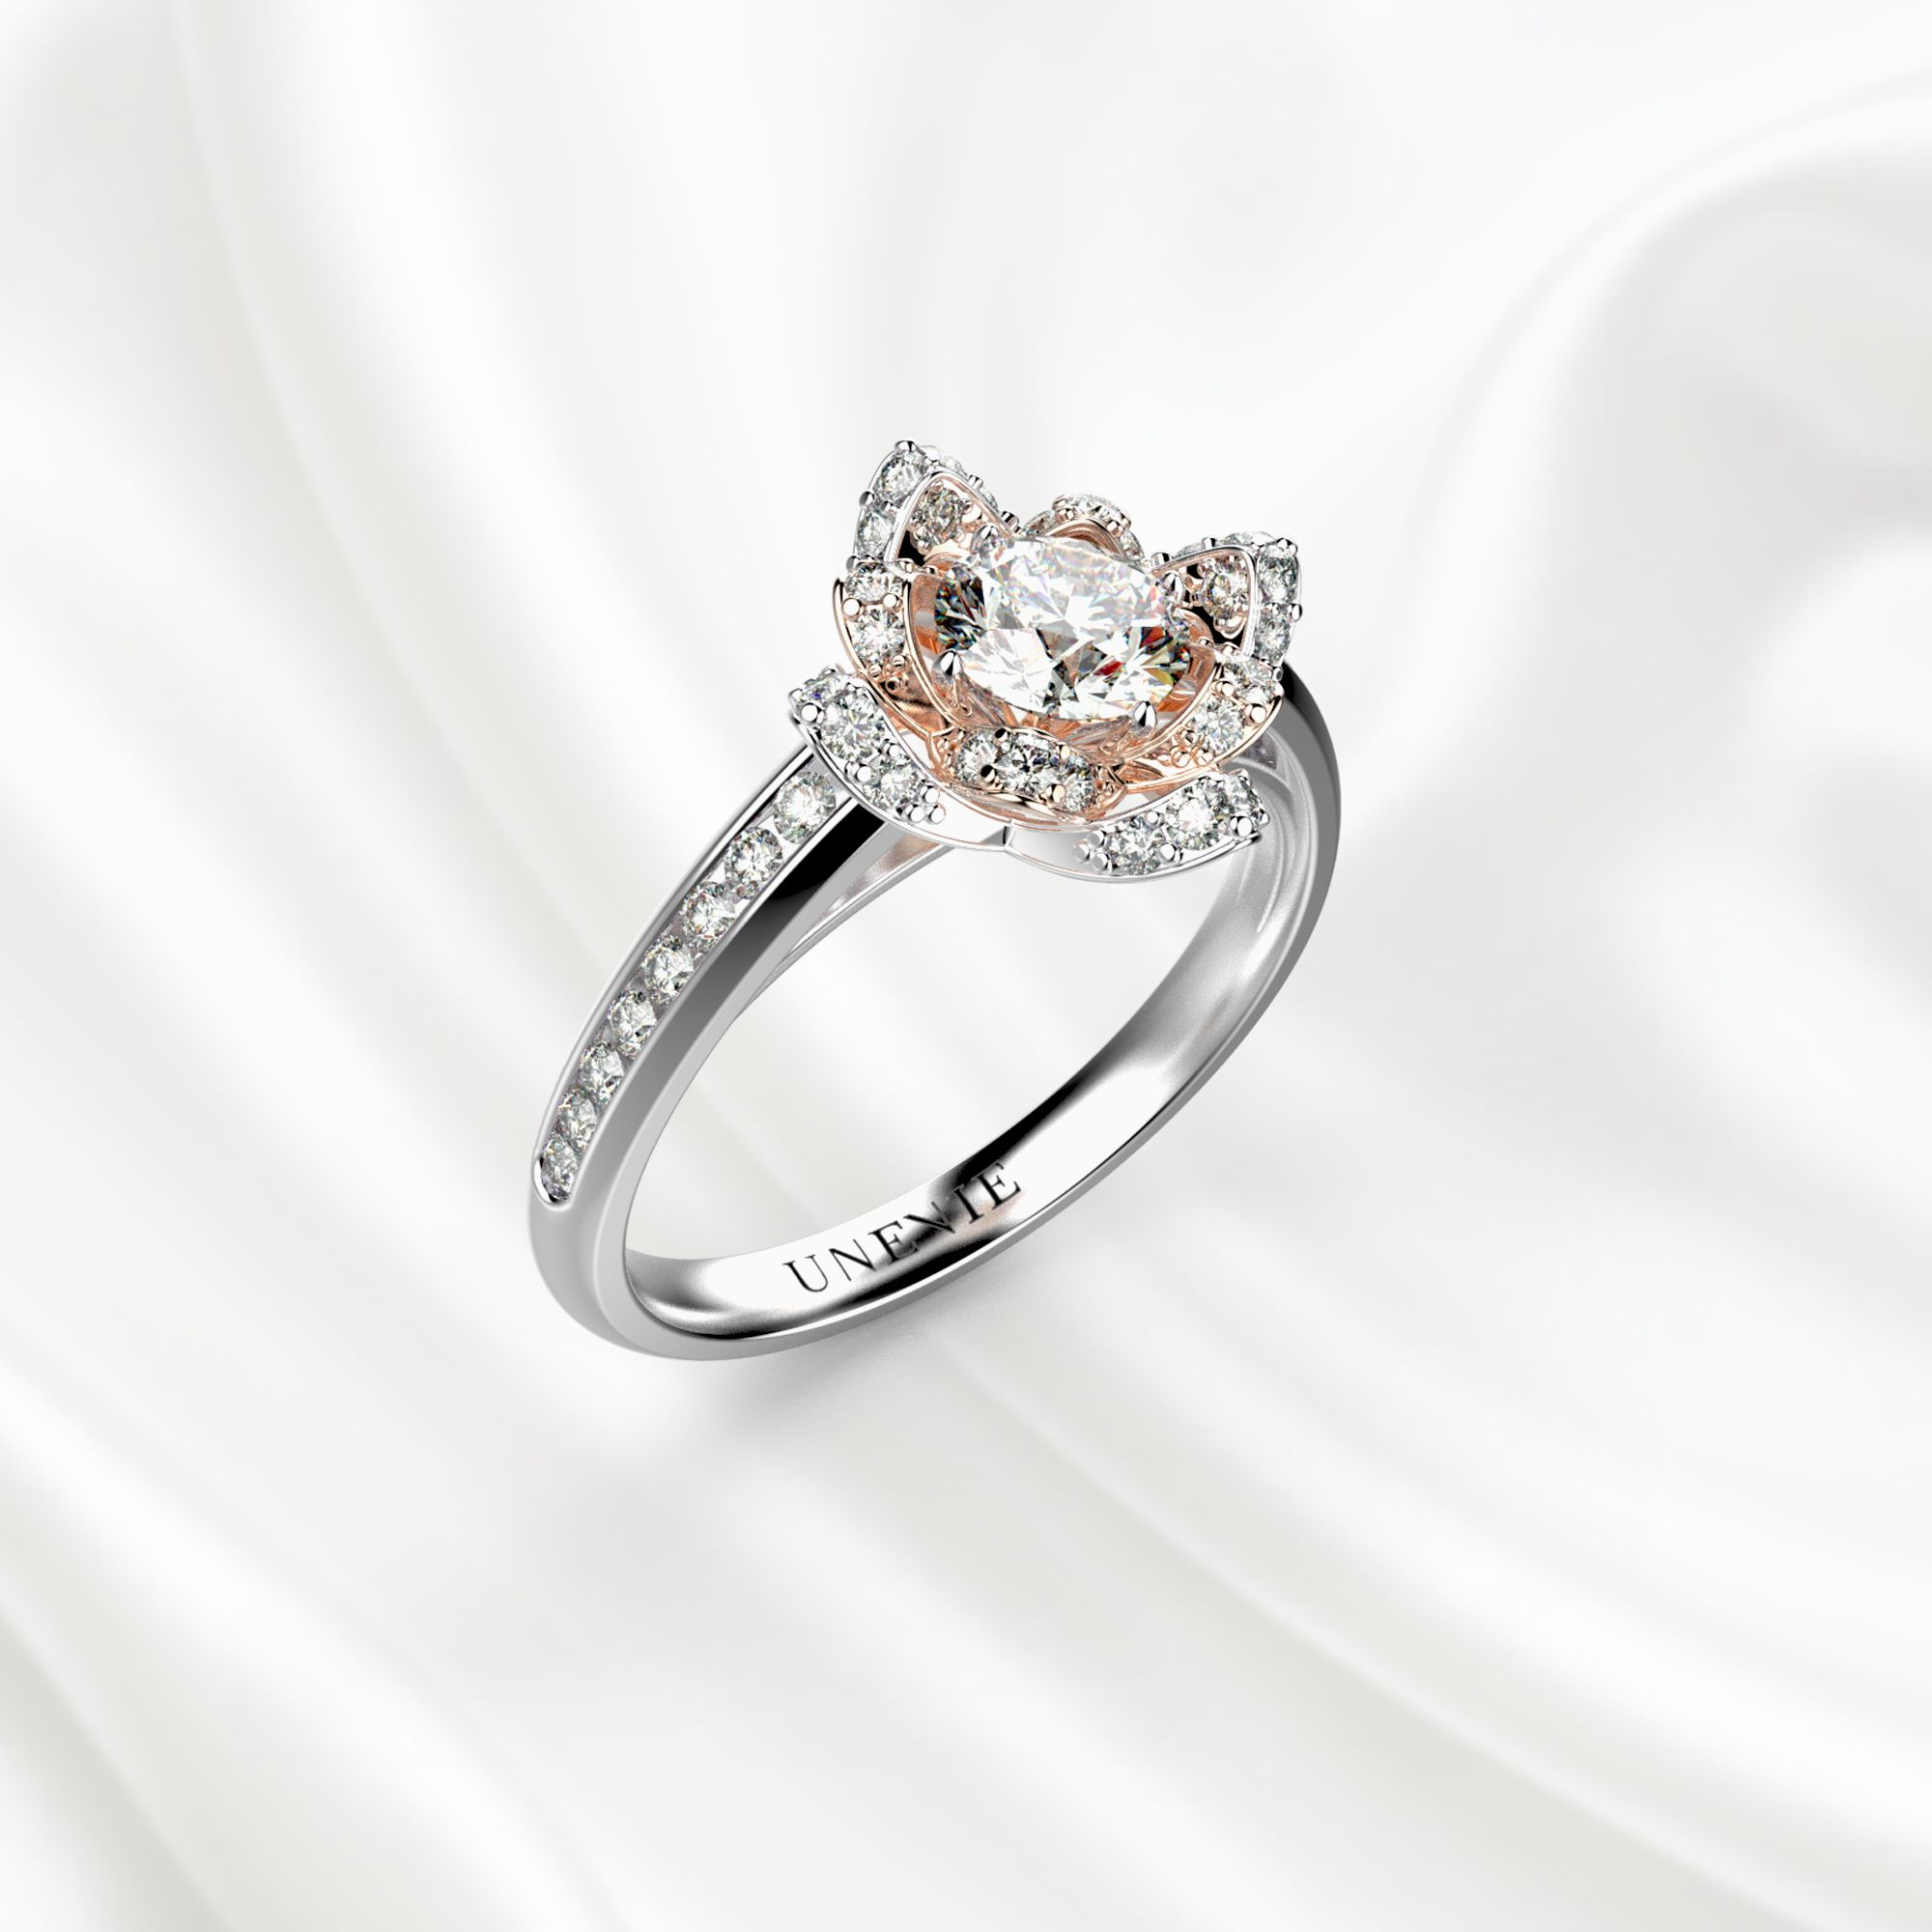 N13 Помолвочное кольцо из бело-розового золота с бриллиантом 0.35 карат